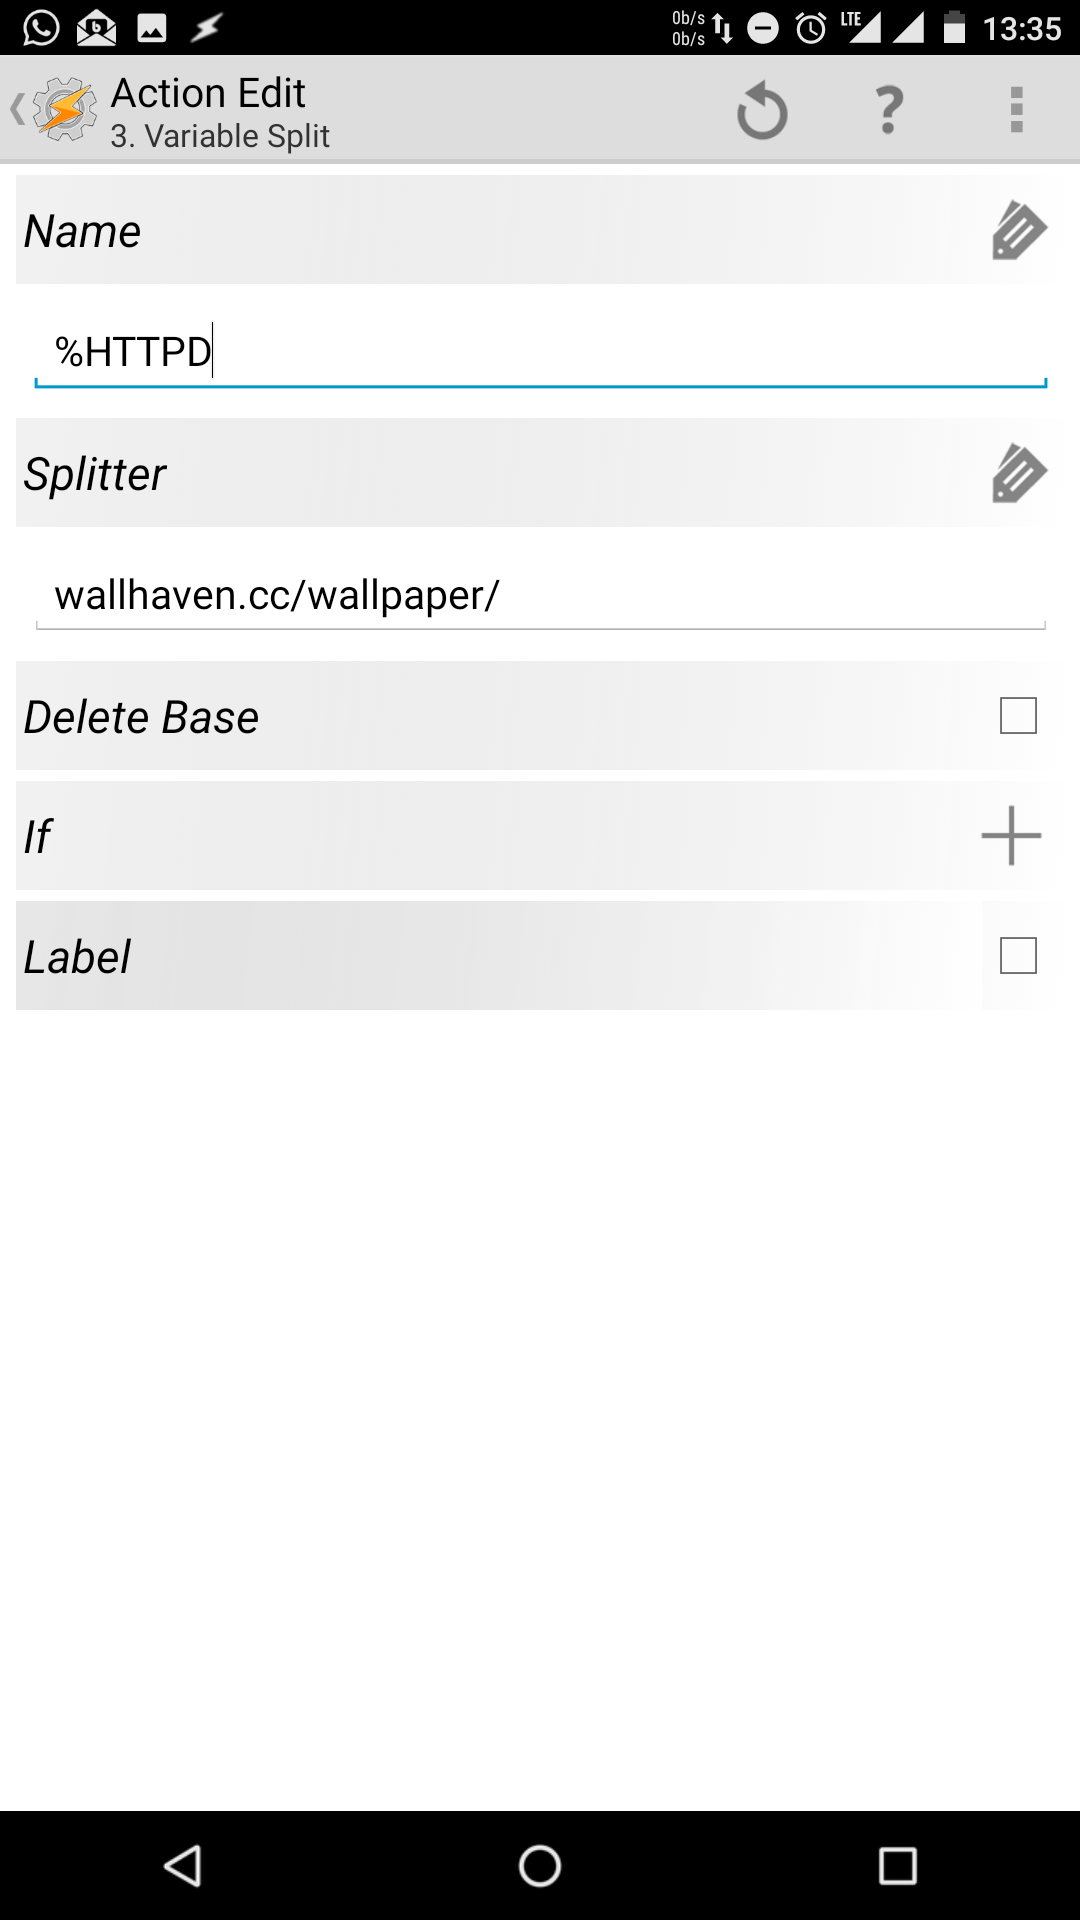 Action Edit - Variable Split